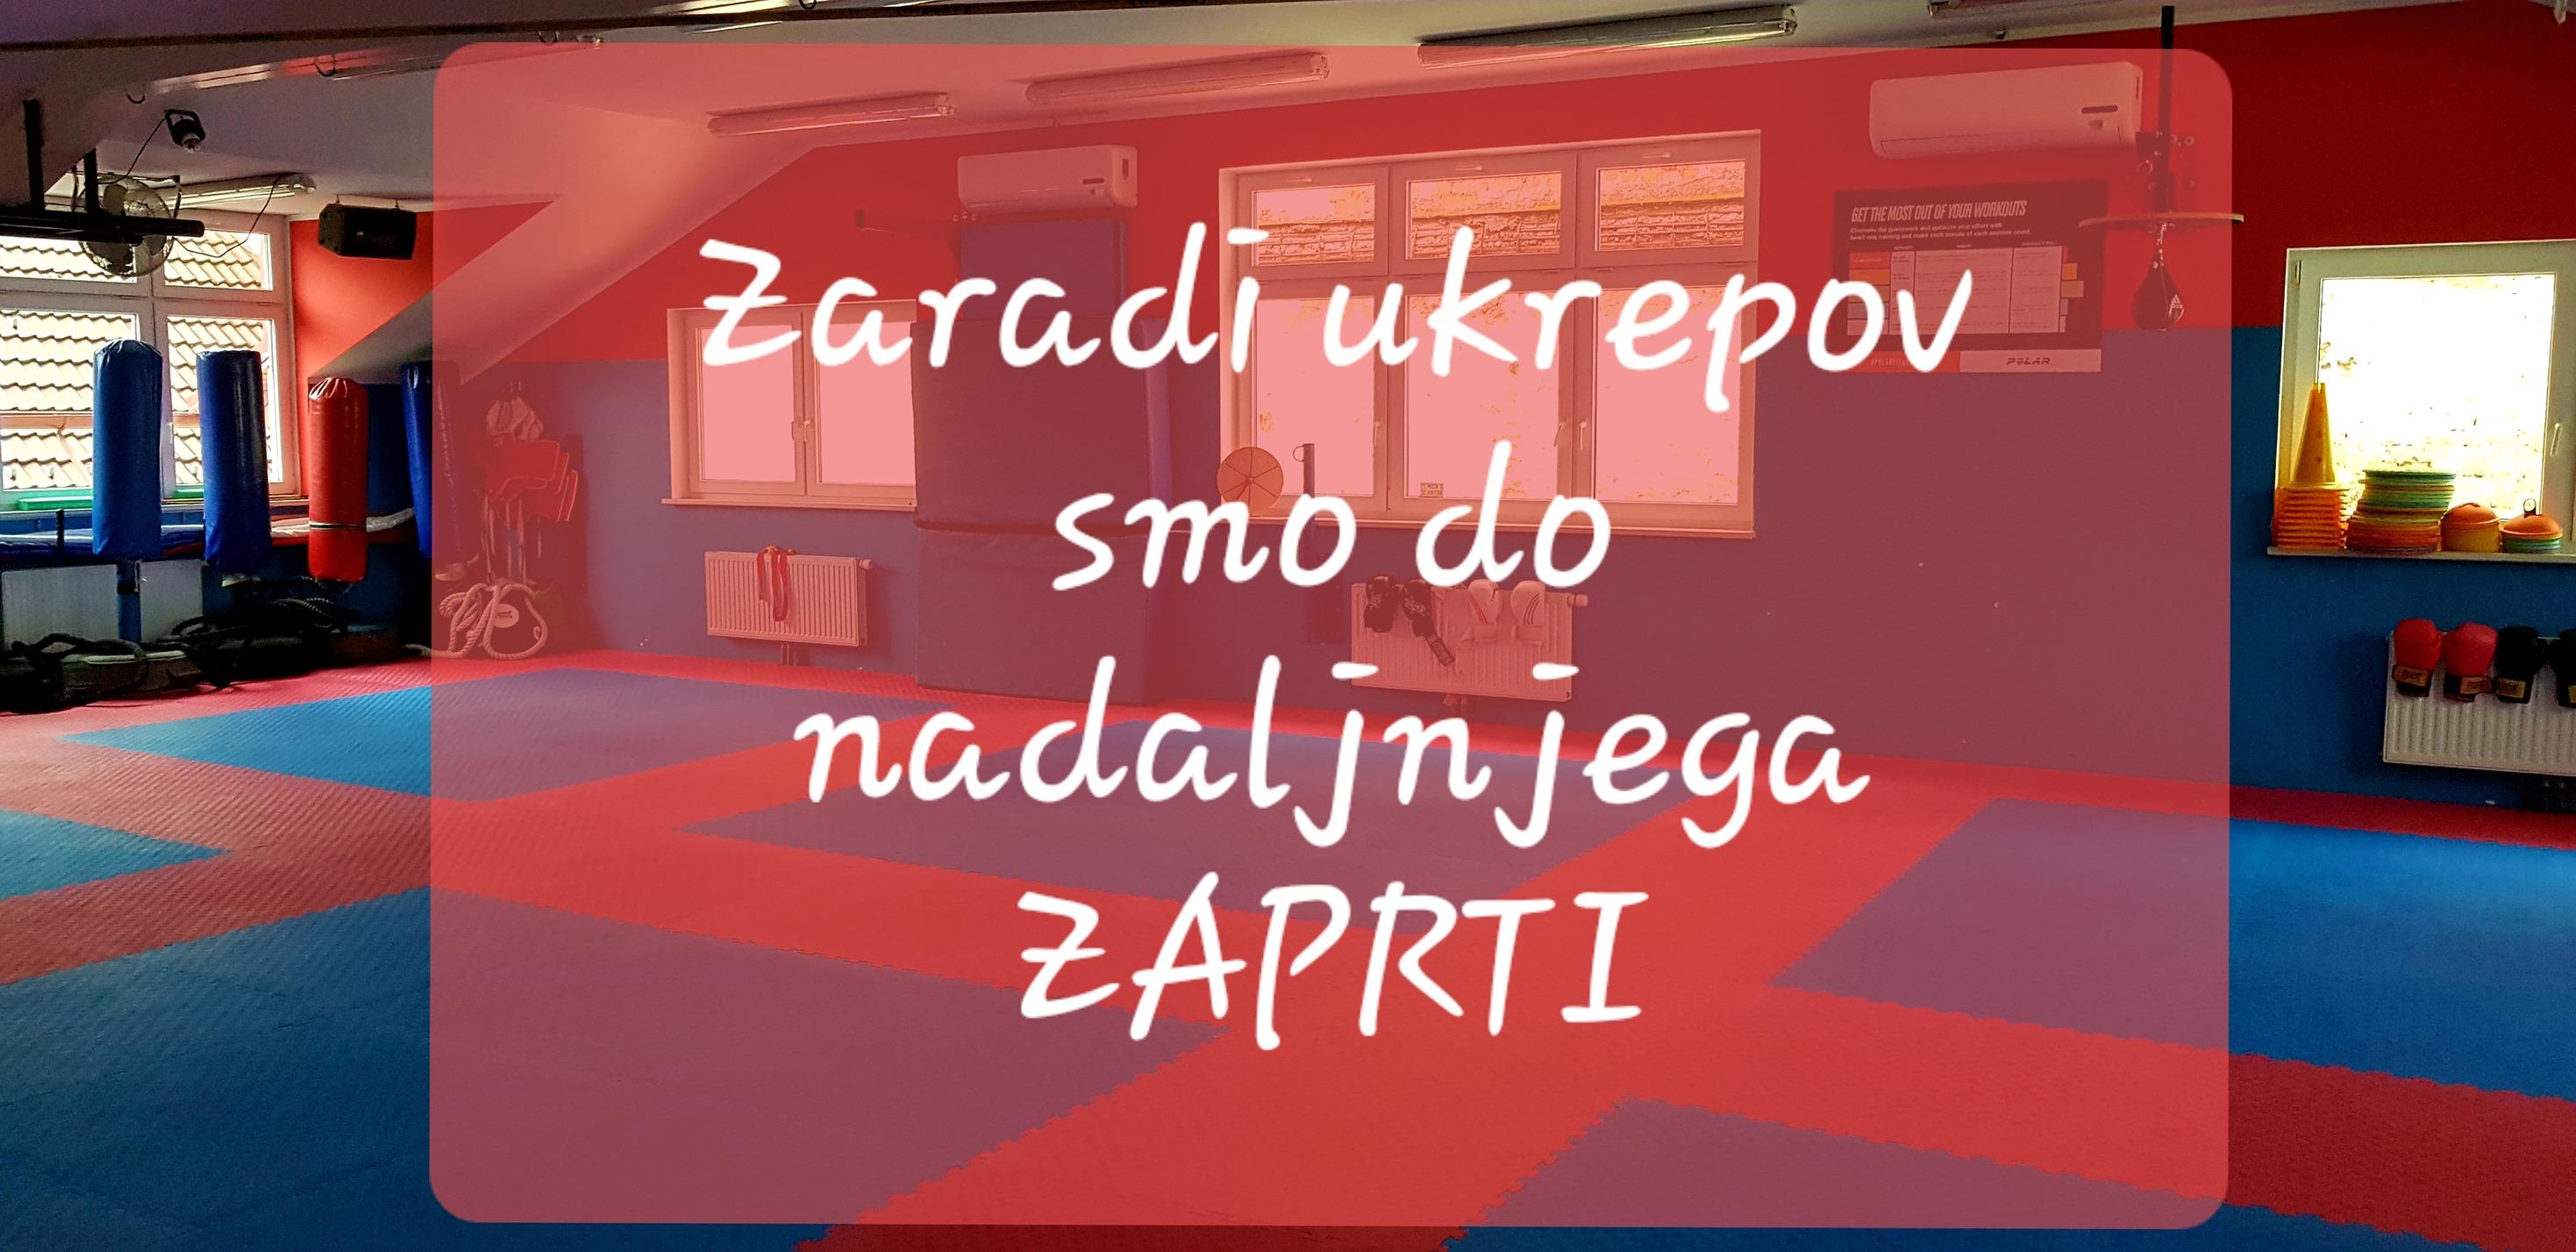 121736258_825867134835719_4138215489225239592_o